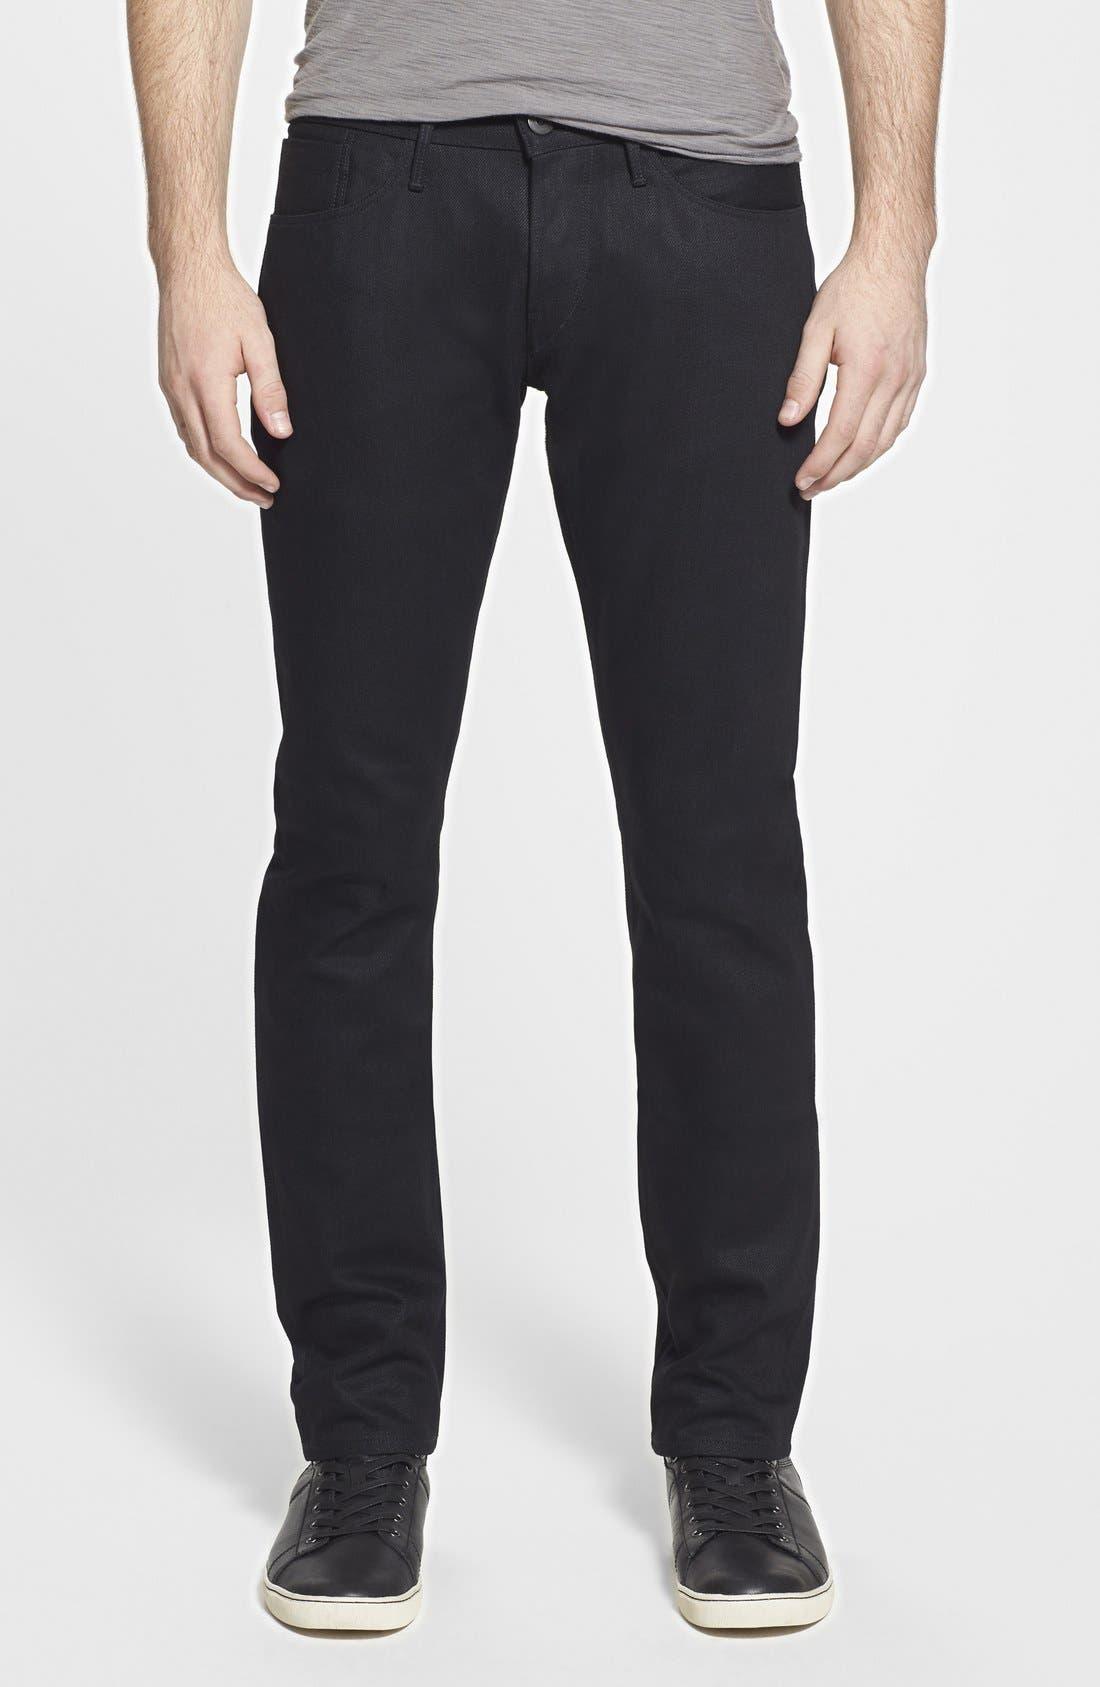 3x1 NYC 'M5' Skinny Fit Selvedge Jeans (XX Raw)